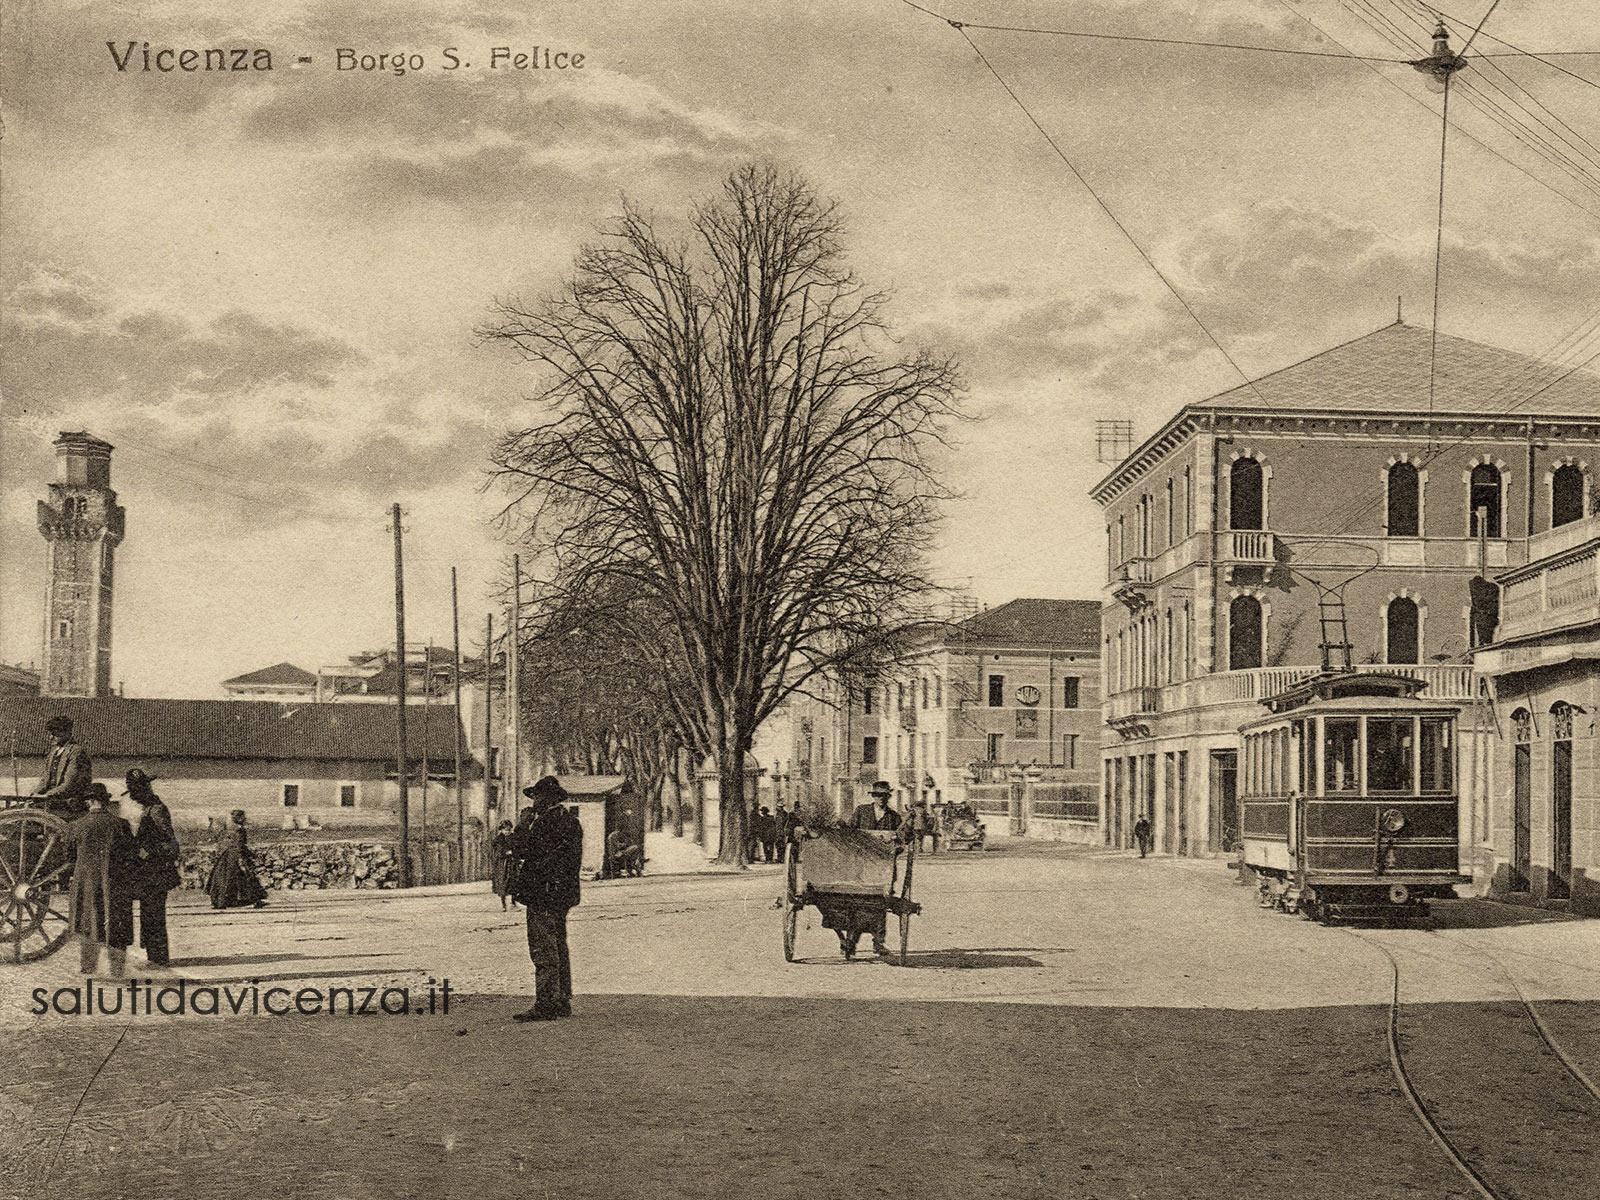 L'antico borgo San Felice